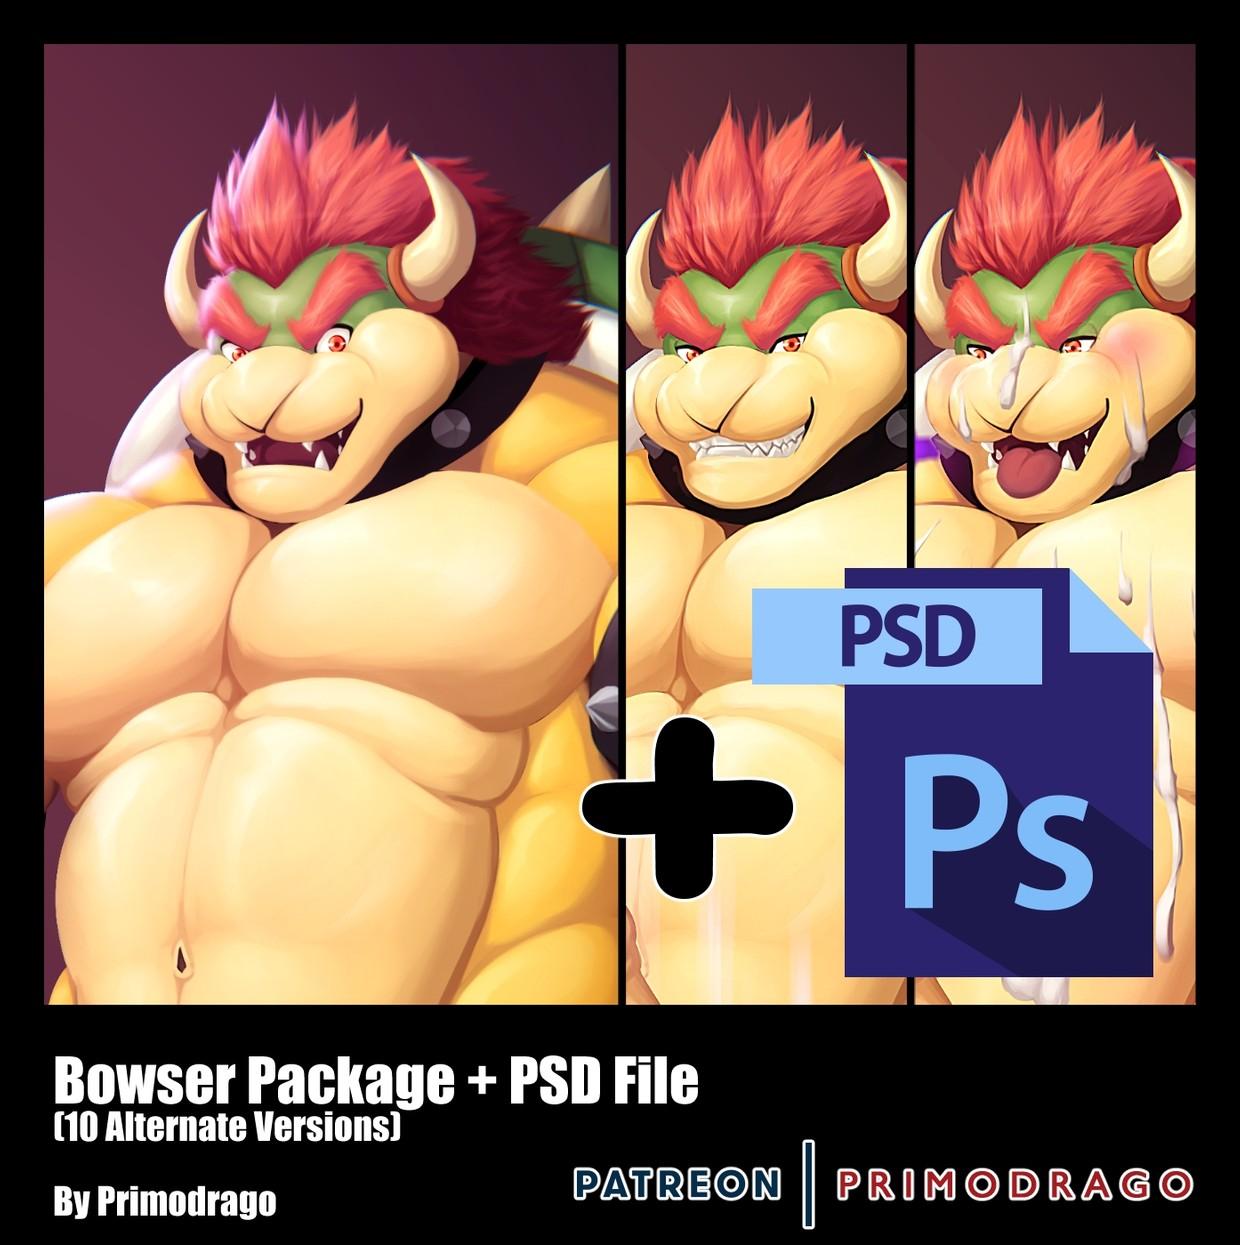 Bowser Artpack + PSD File